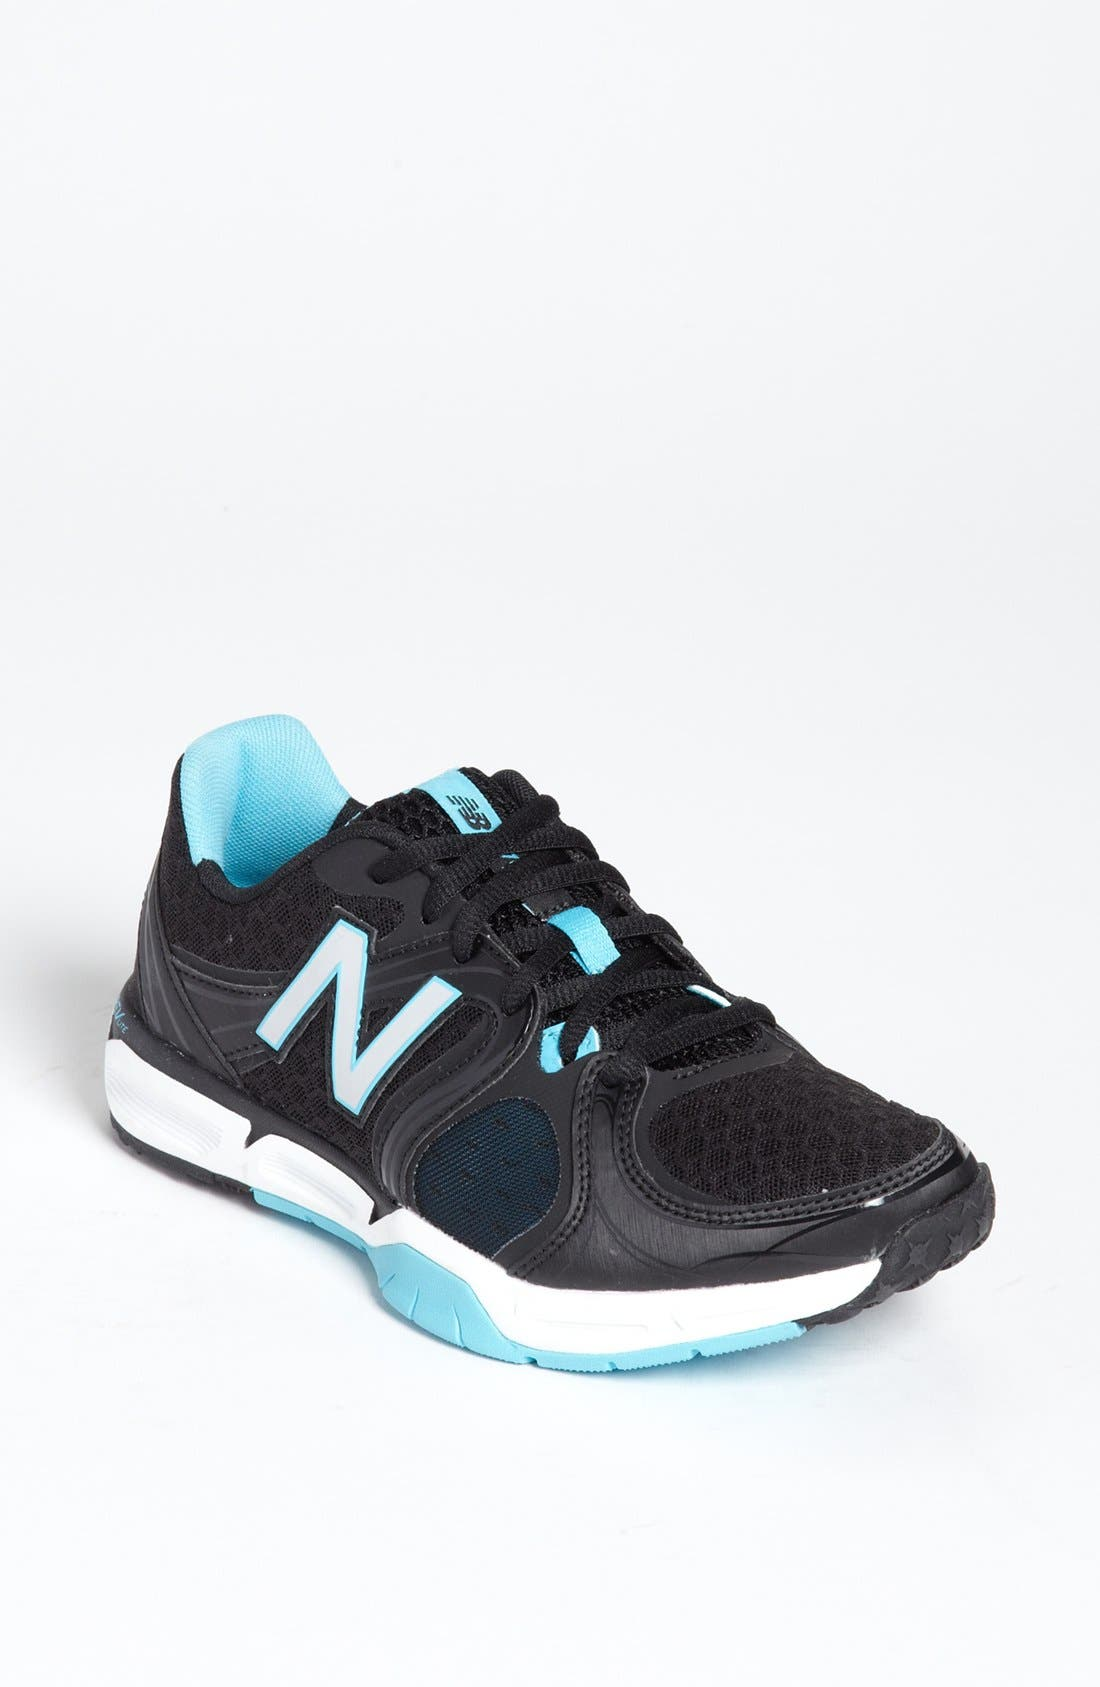 Main Image - New Balance '797' Training Shoe (Women) (Online Only)